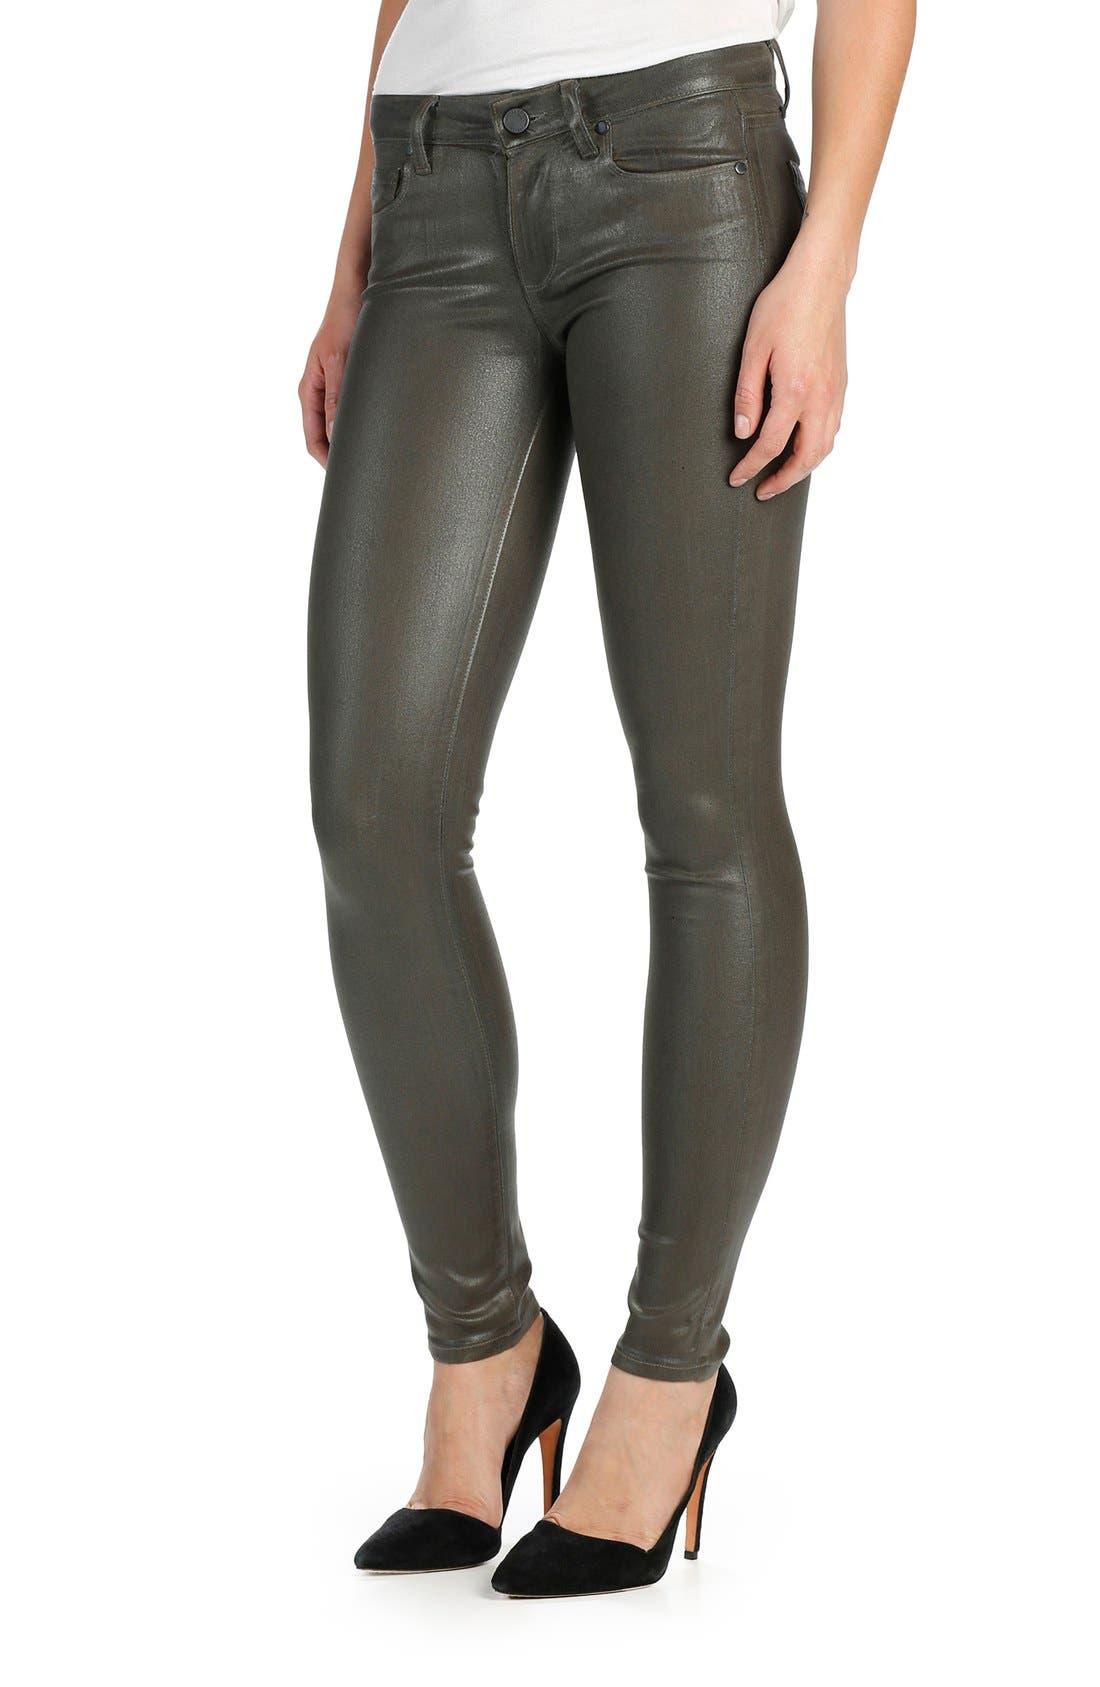 Main Image - PAIGE Transcend Verdugo Coated Ultra Skinny Jeans